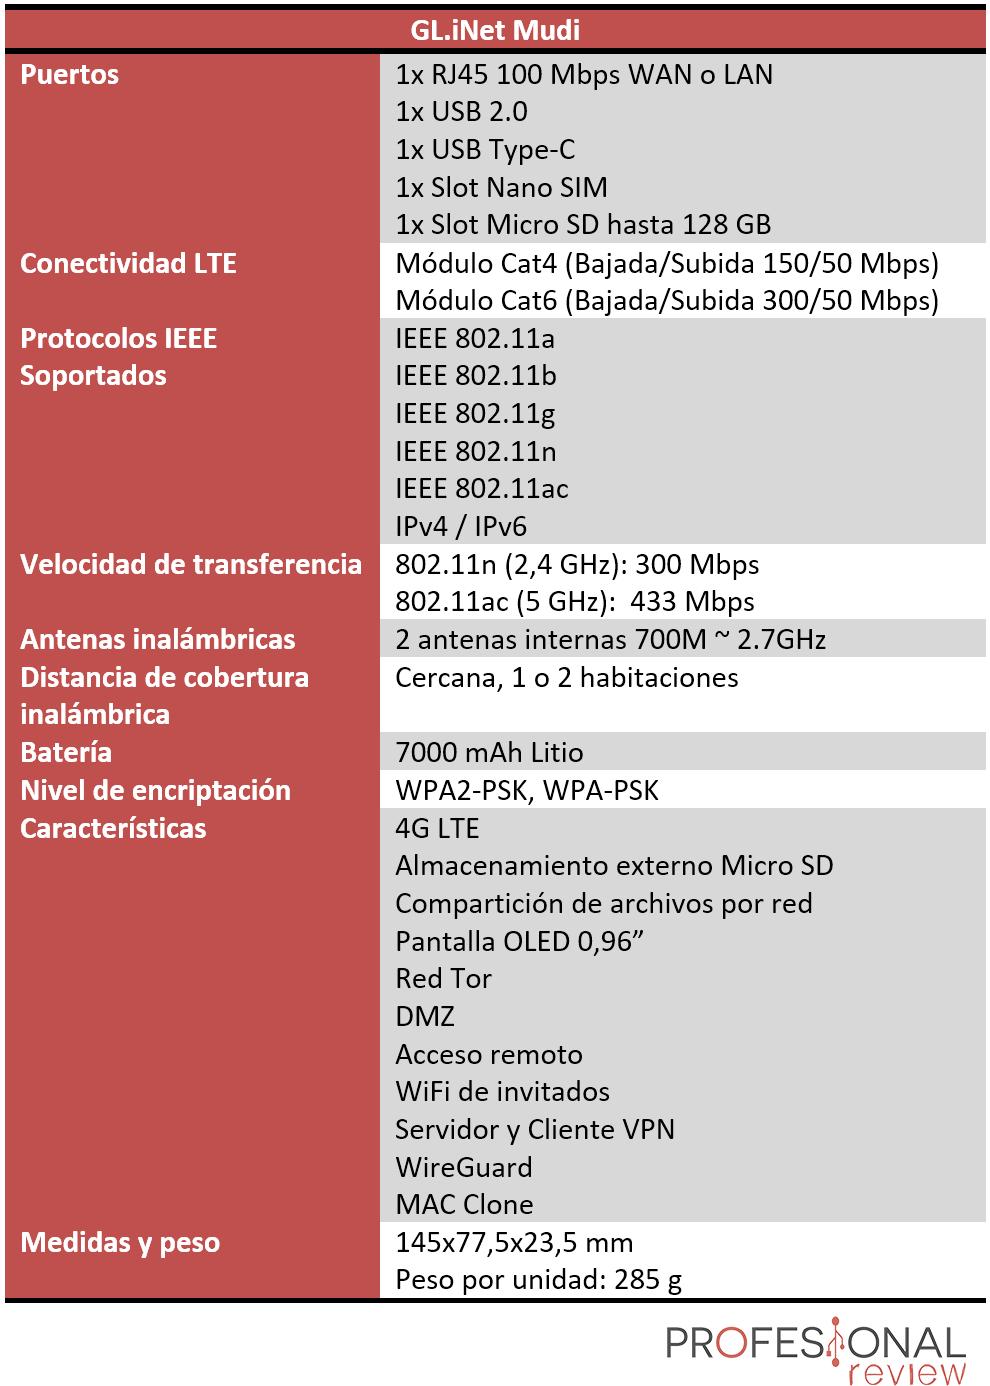 GL.iNet Mudi Características